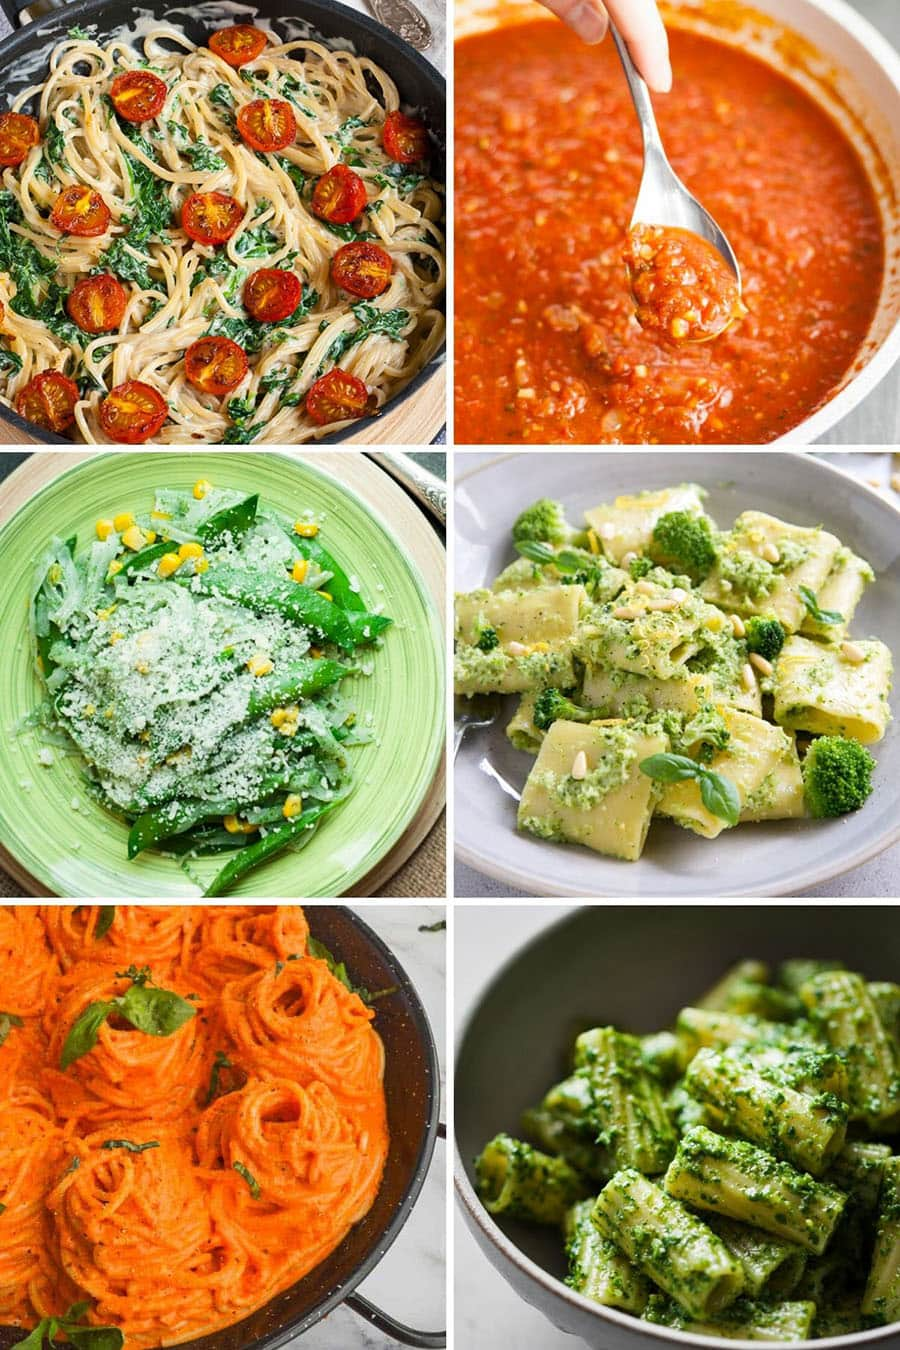 Collage of 6 vegan pasta sauce recipes: alfredo, marinara, creamy spinach, broccoli pesto, roasted red pepper, parsley pesto